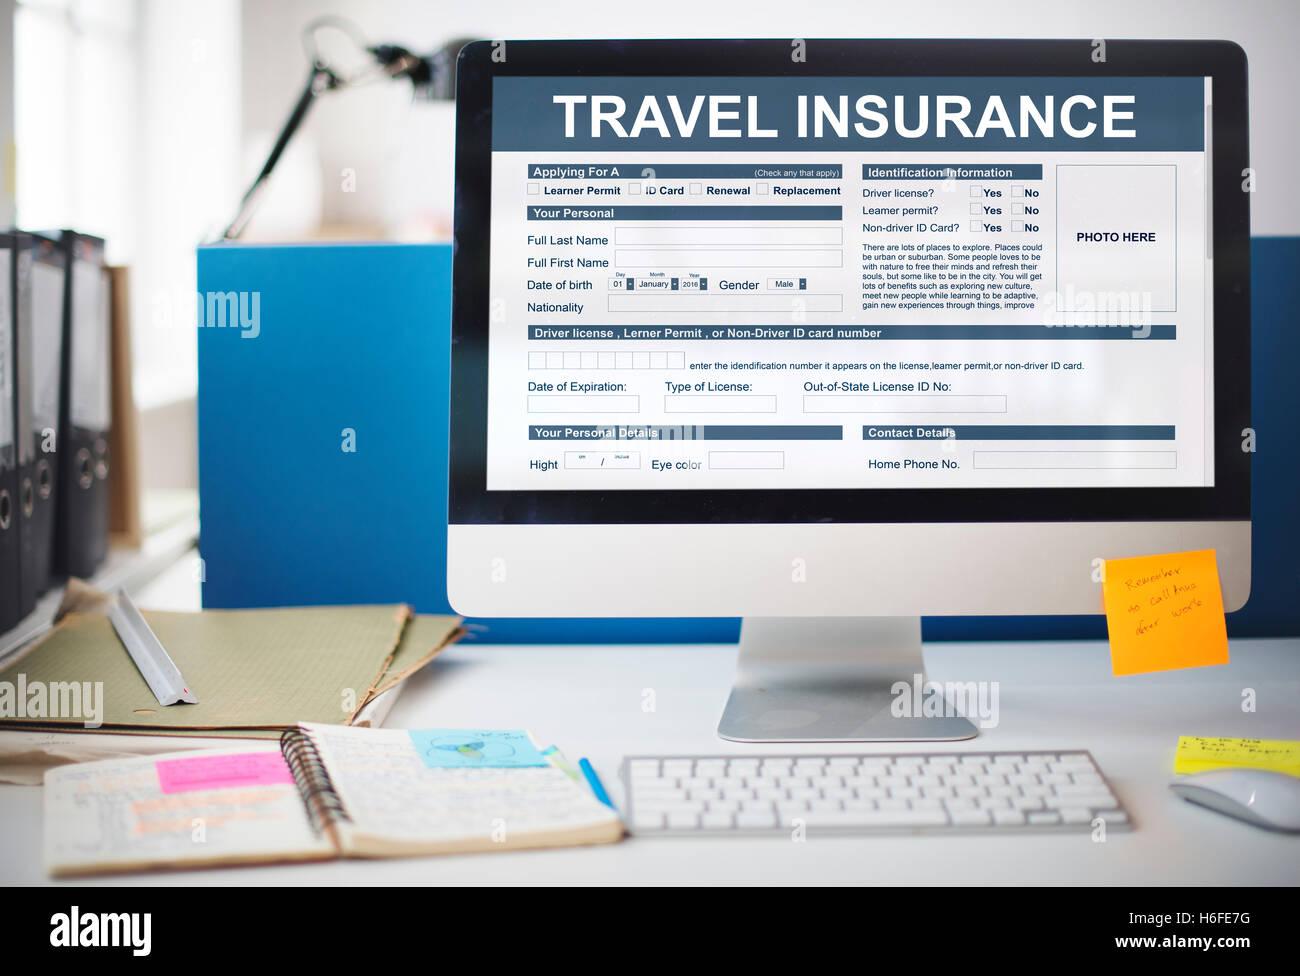 Travel Insurance Form Transportation Concept - Stock Image